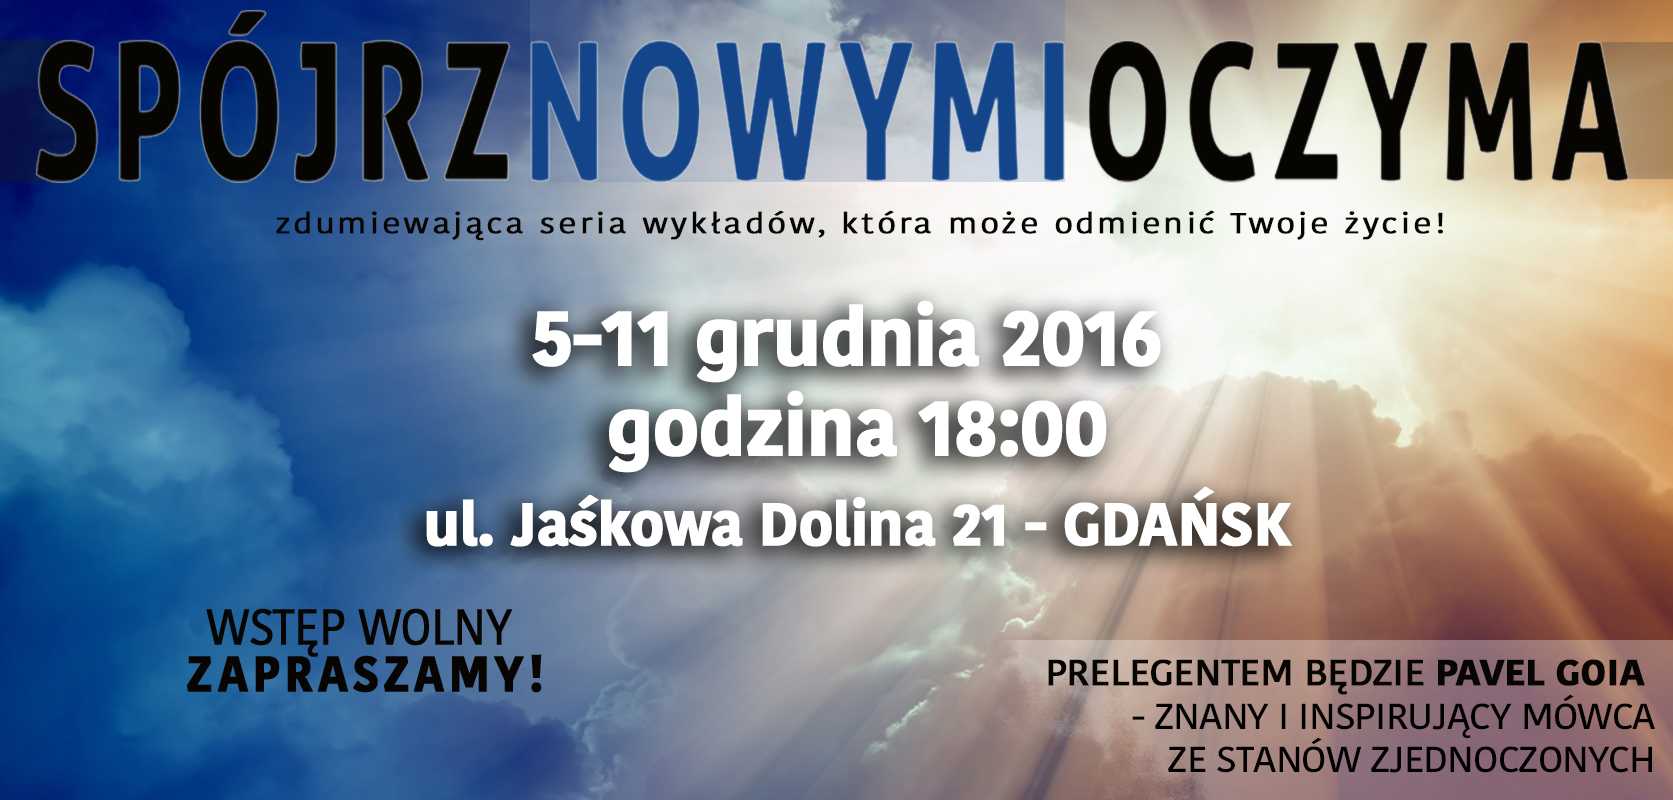 2016-11-08-goja-facebook2